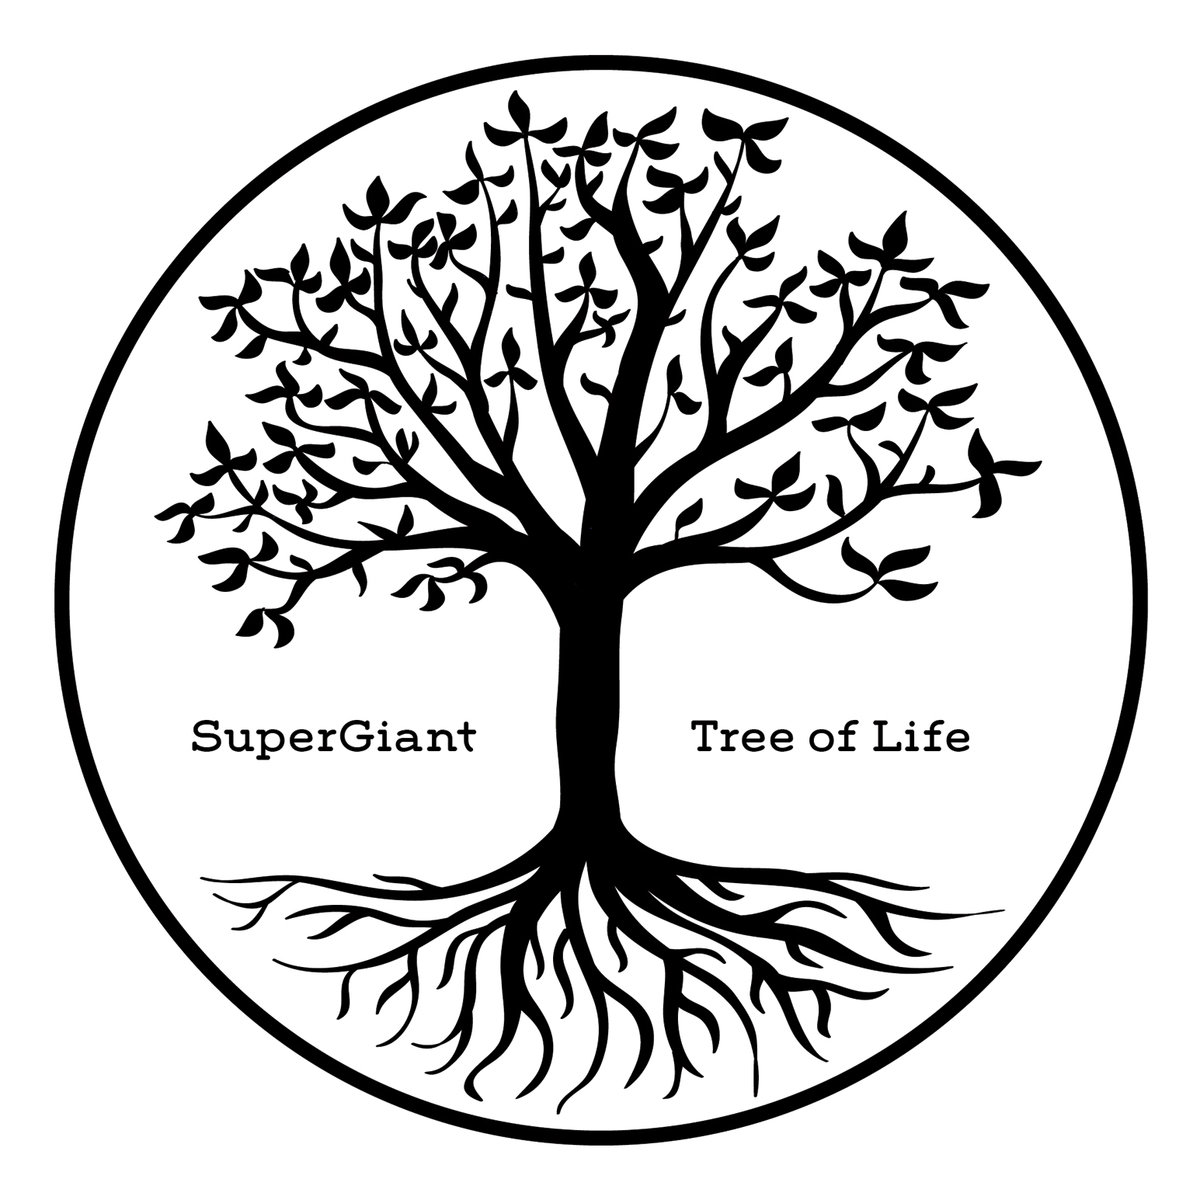 1200x1200 Tree Of Life Supergiant